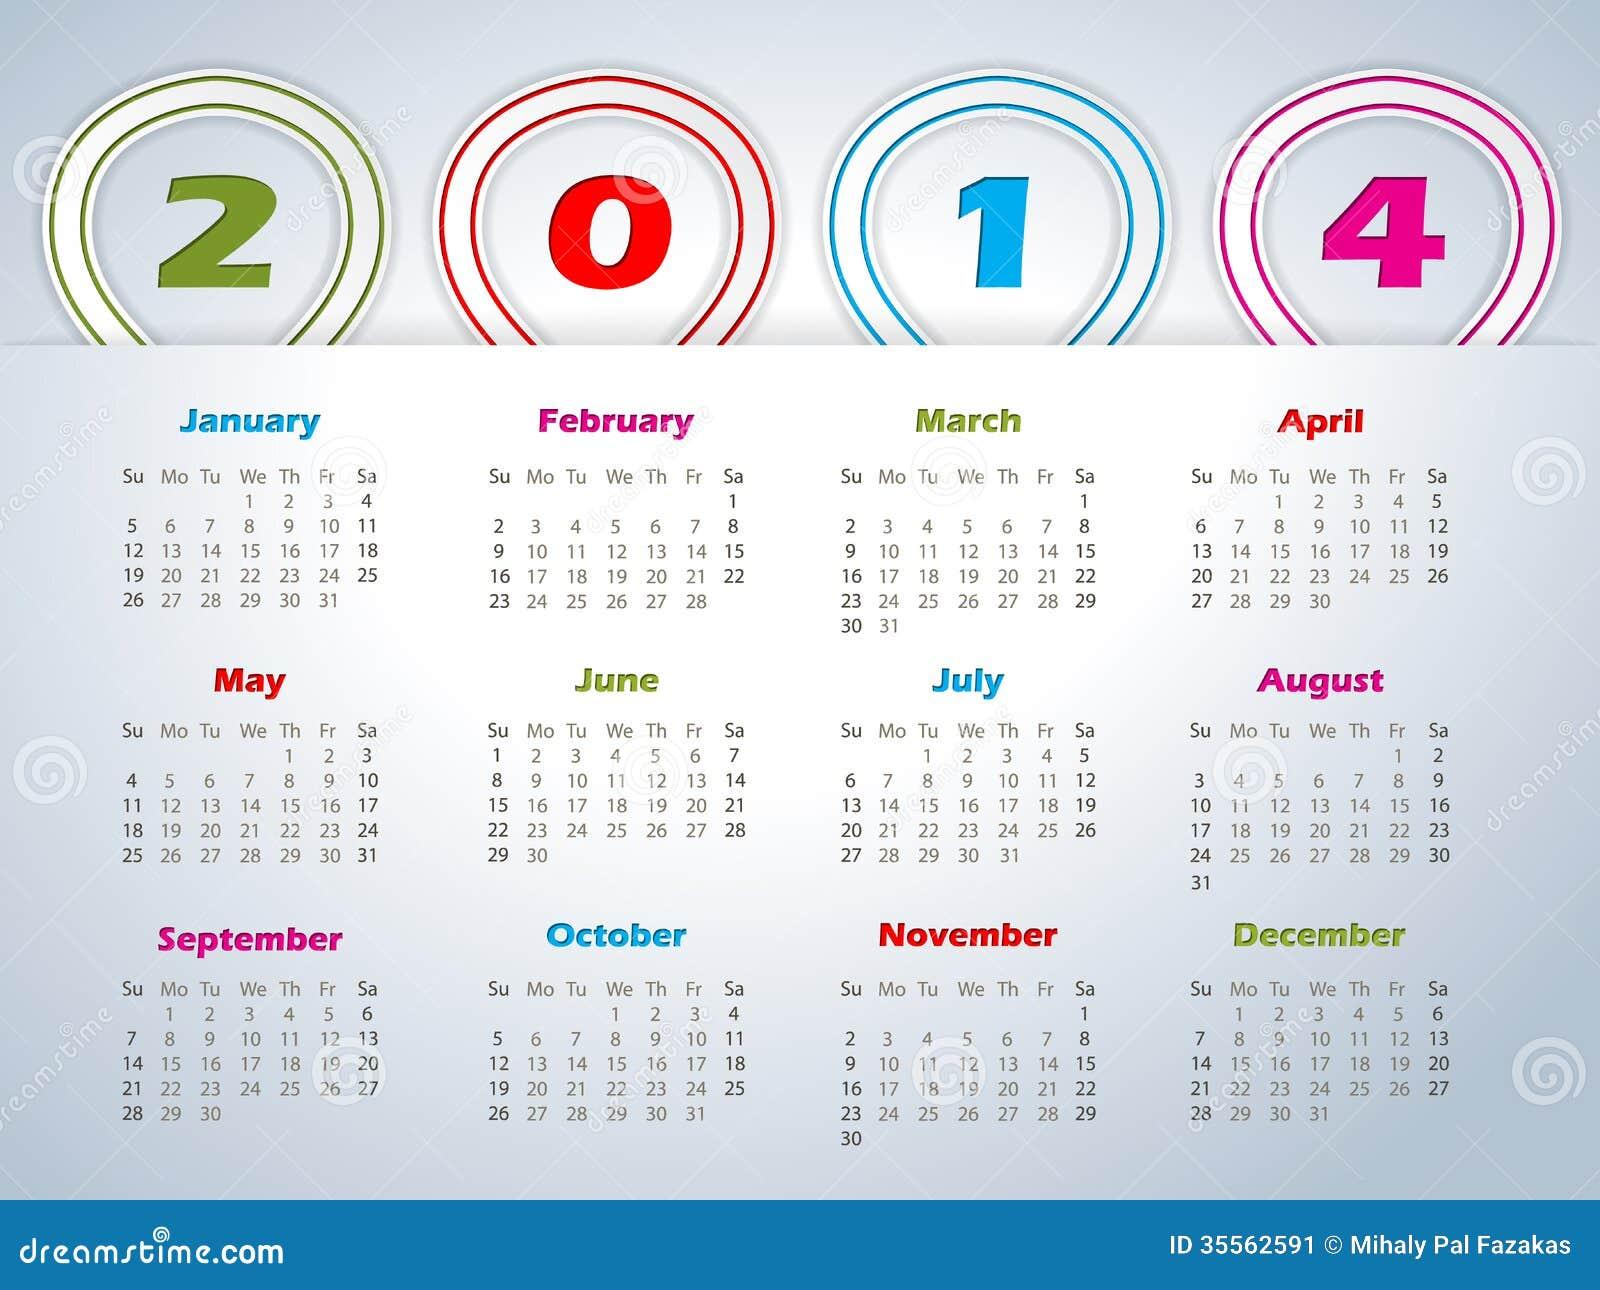 Calendar Ribbon Design : Calendar with balloon shaped ribbons stock image